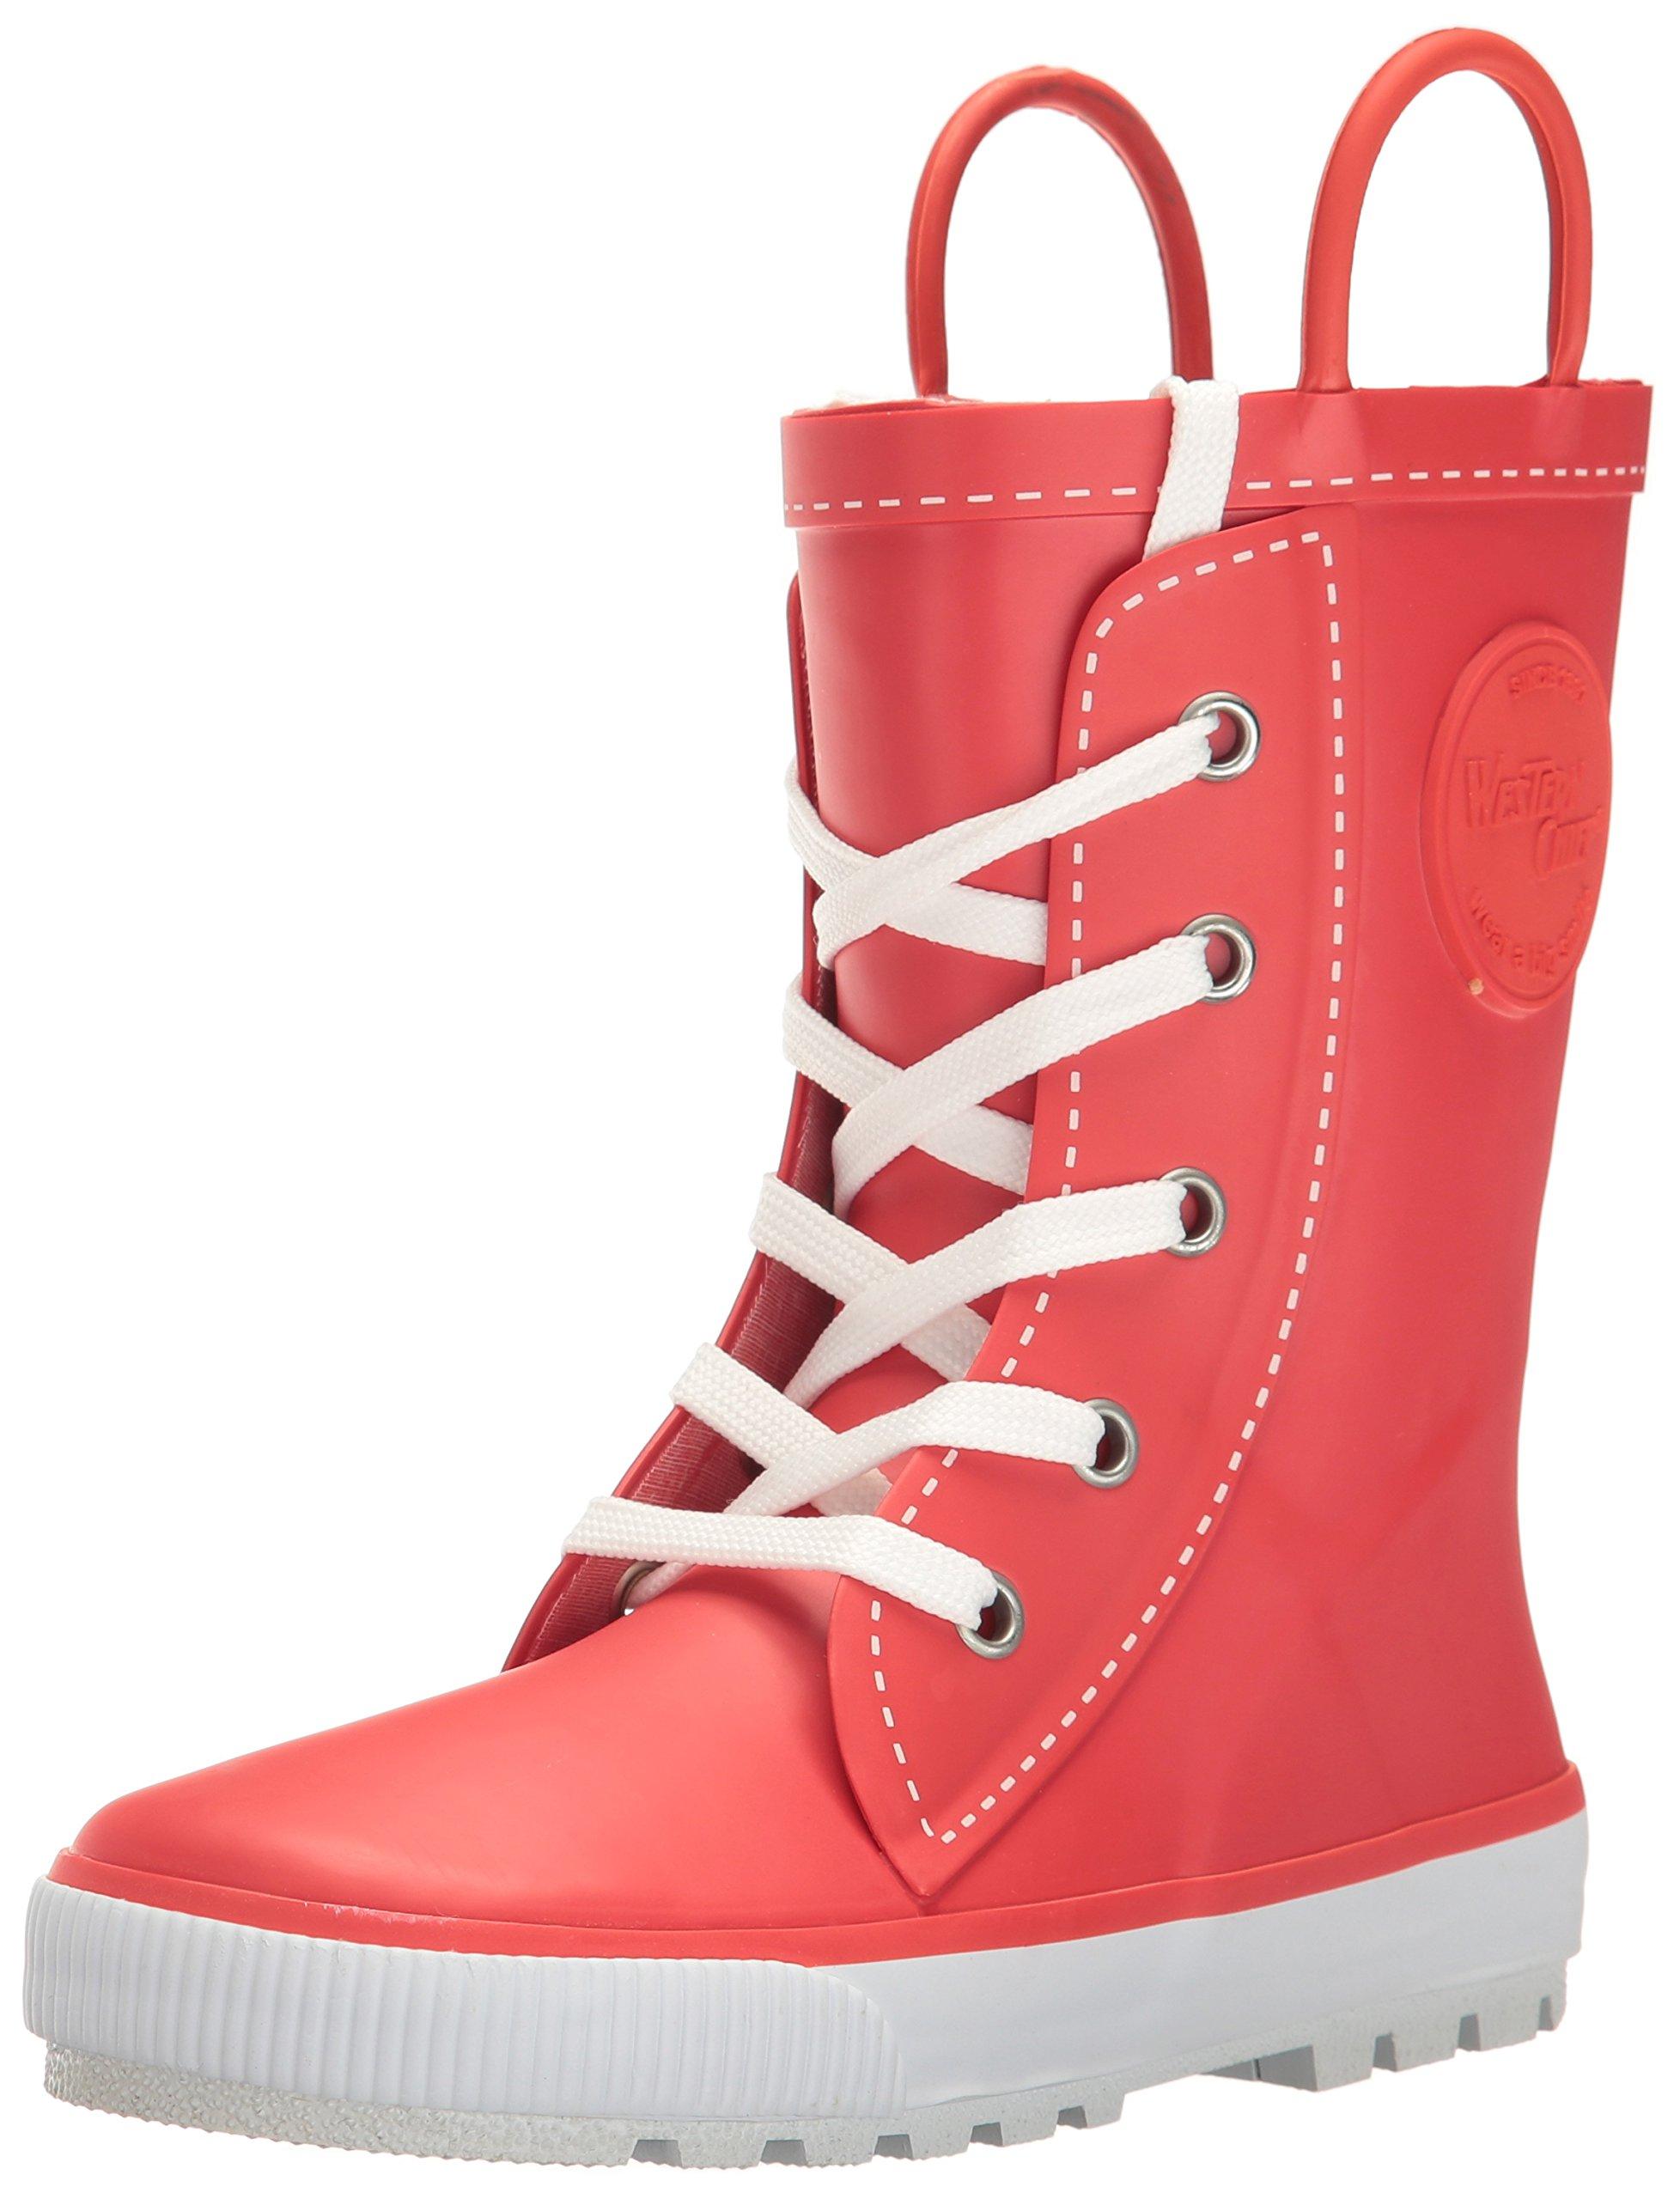 Western Chief Girls' Printed Rain Boot, Sneaker Red, 6 M US Toddler